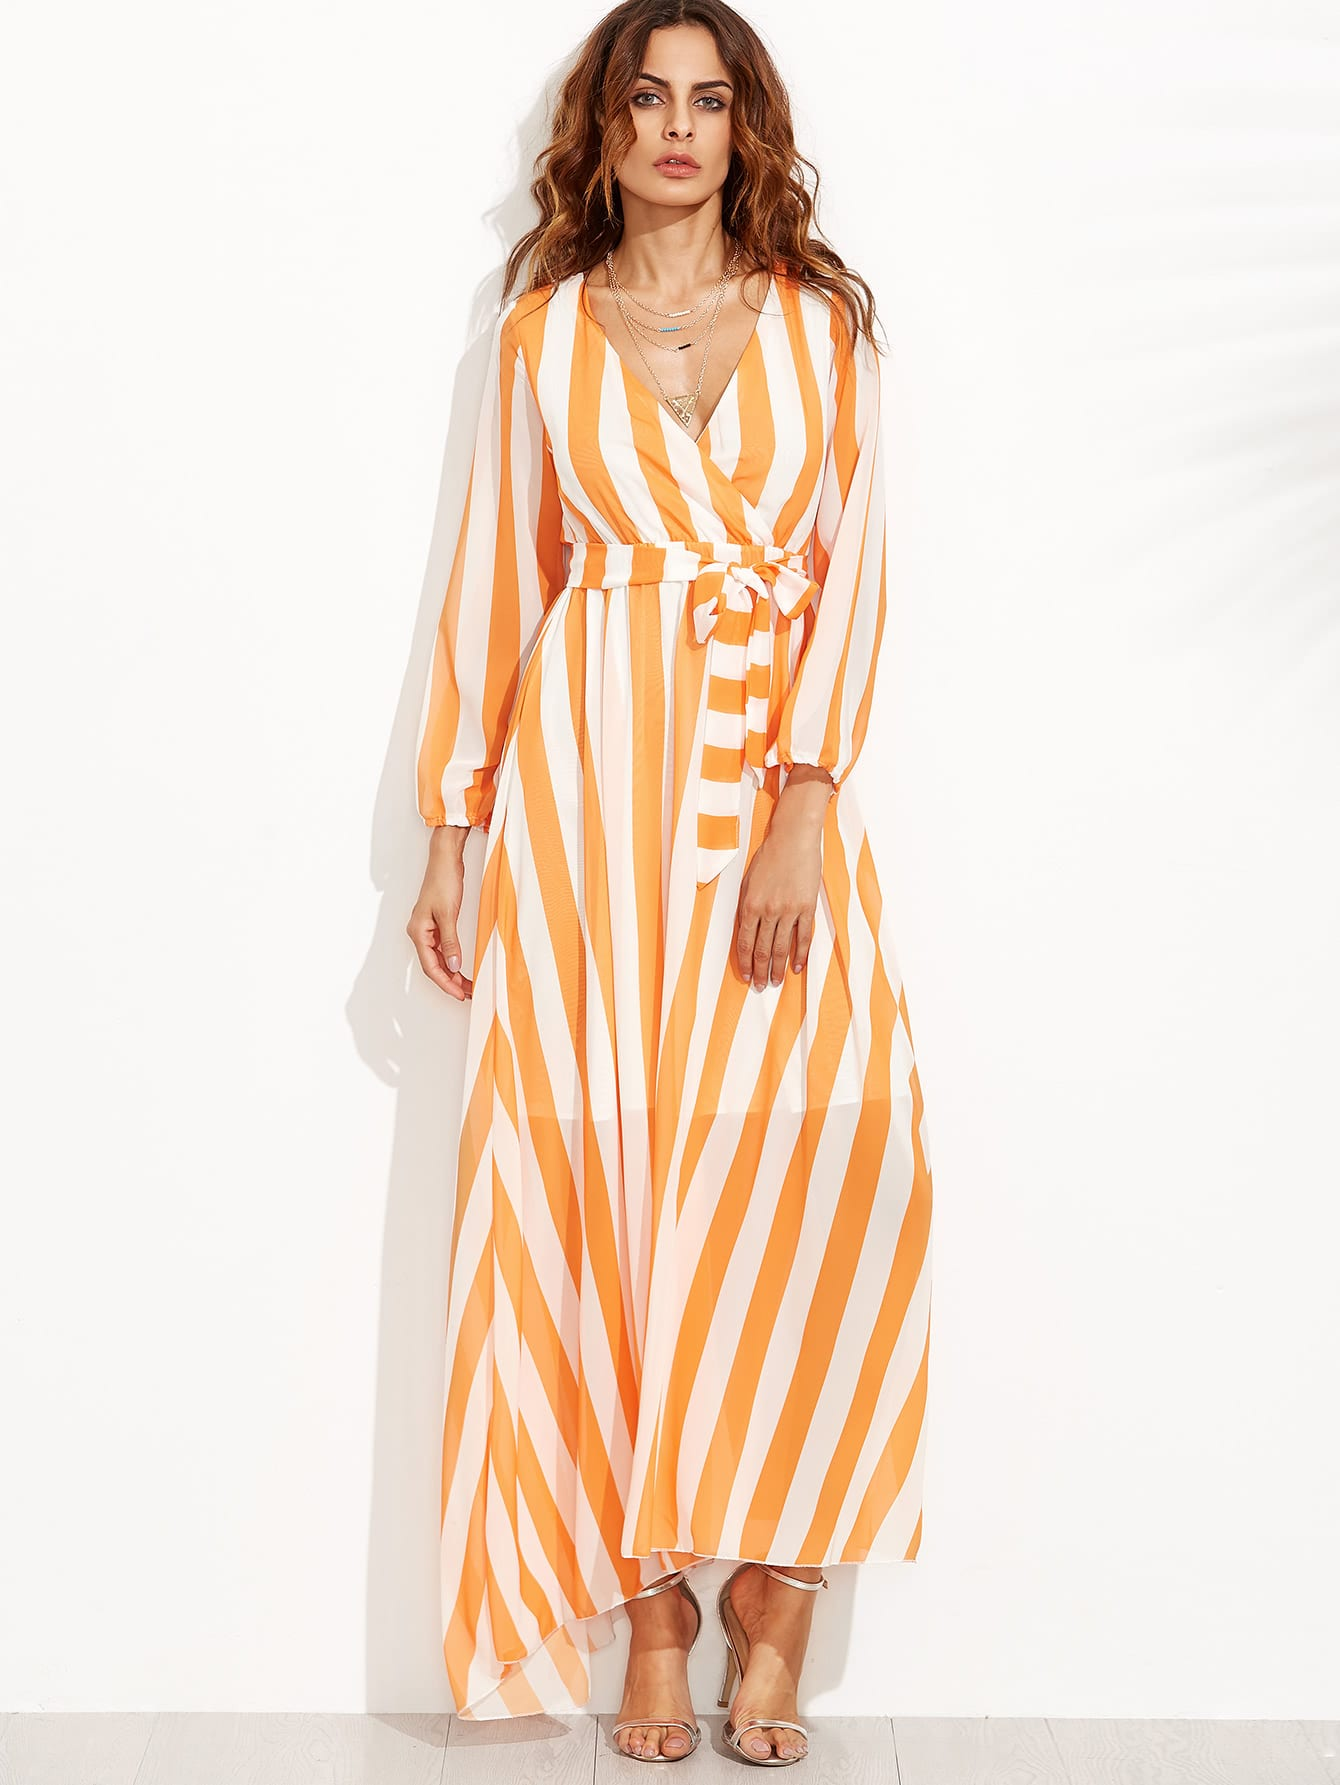 Vertical Striped Deep V Neck Self Tie Dress dress160801101